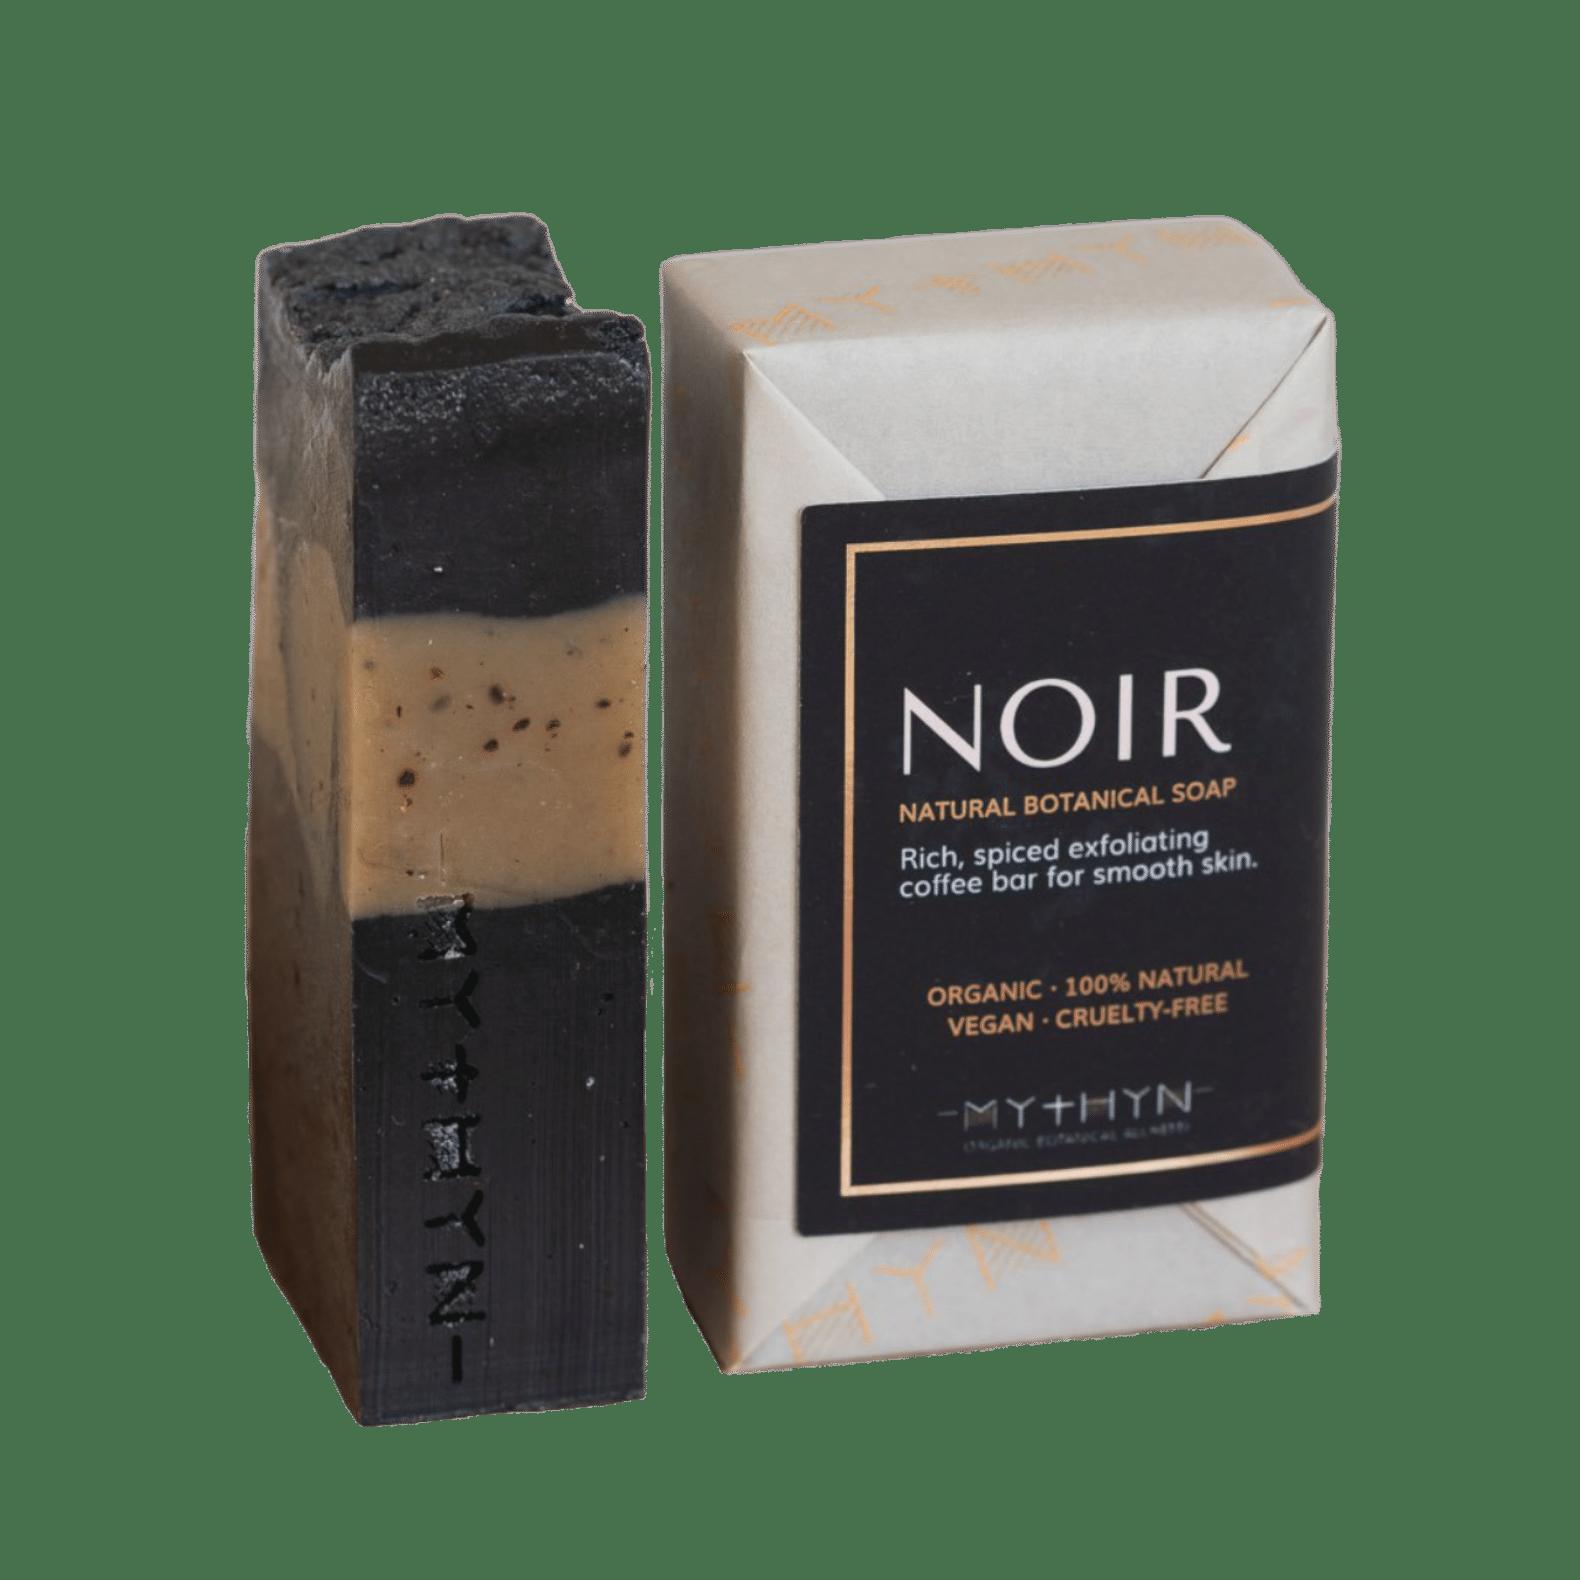 Mythyn - Noir Natural Energising Coffee Botanical Soap